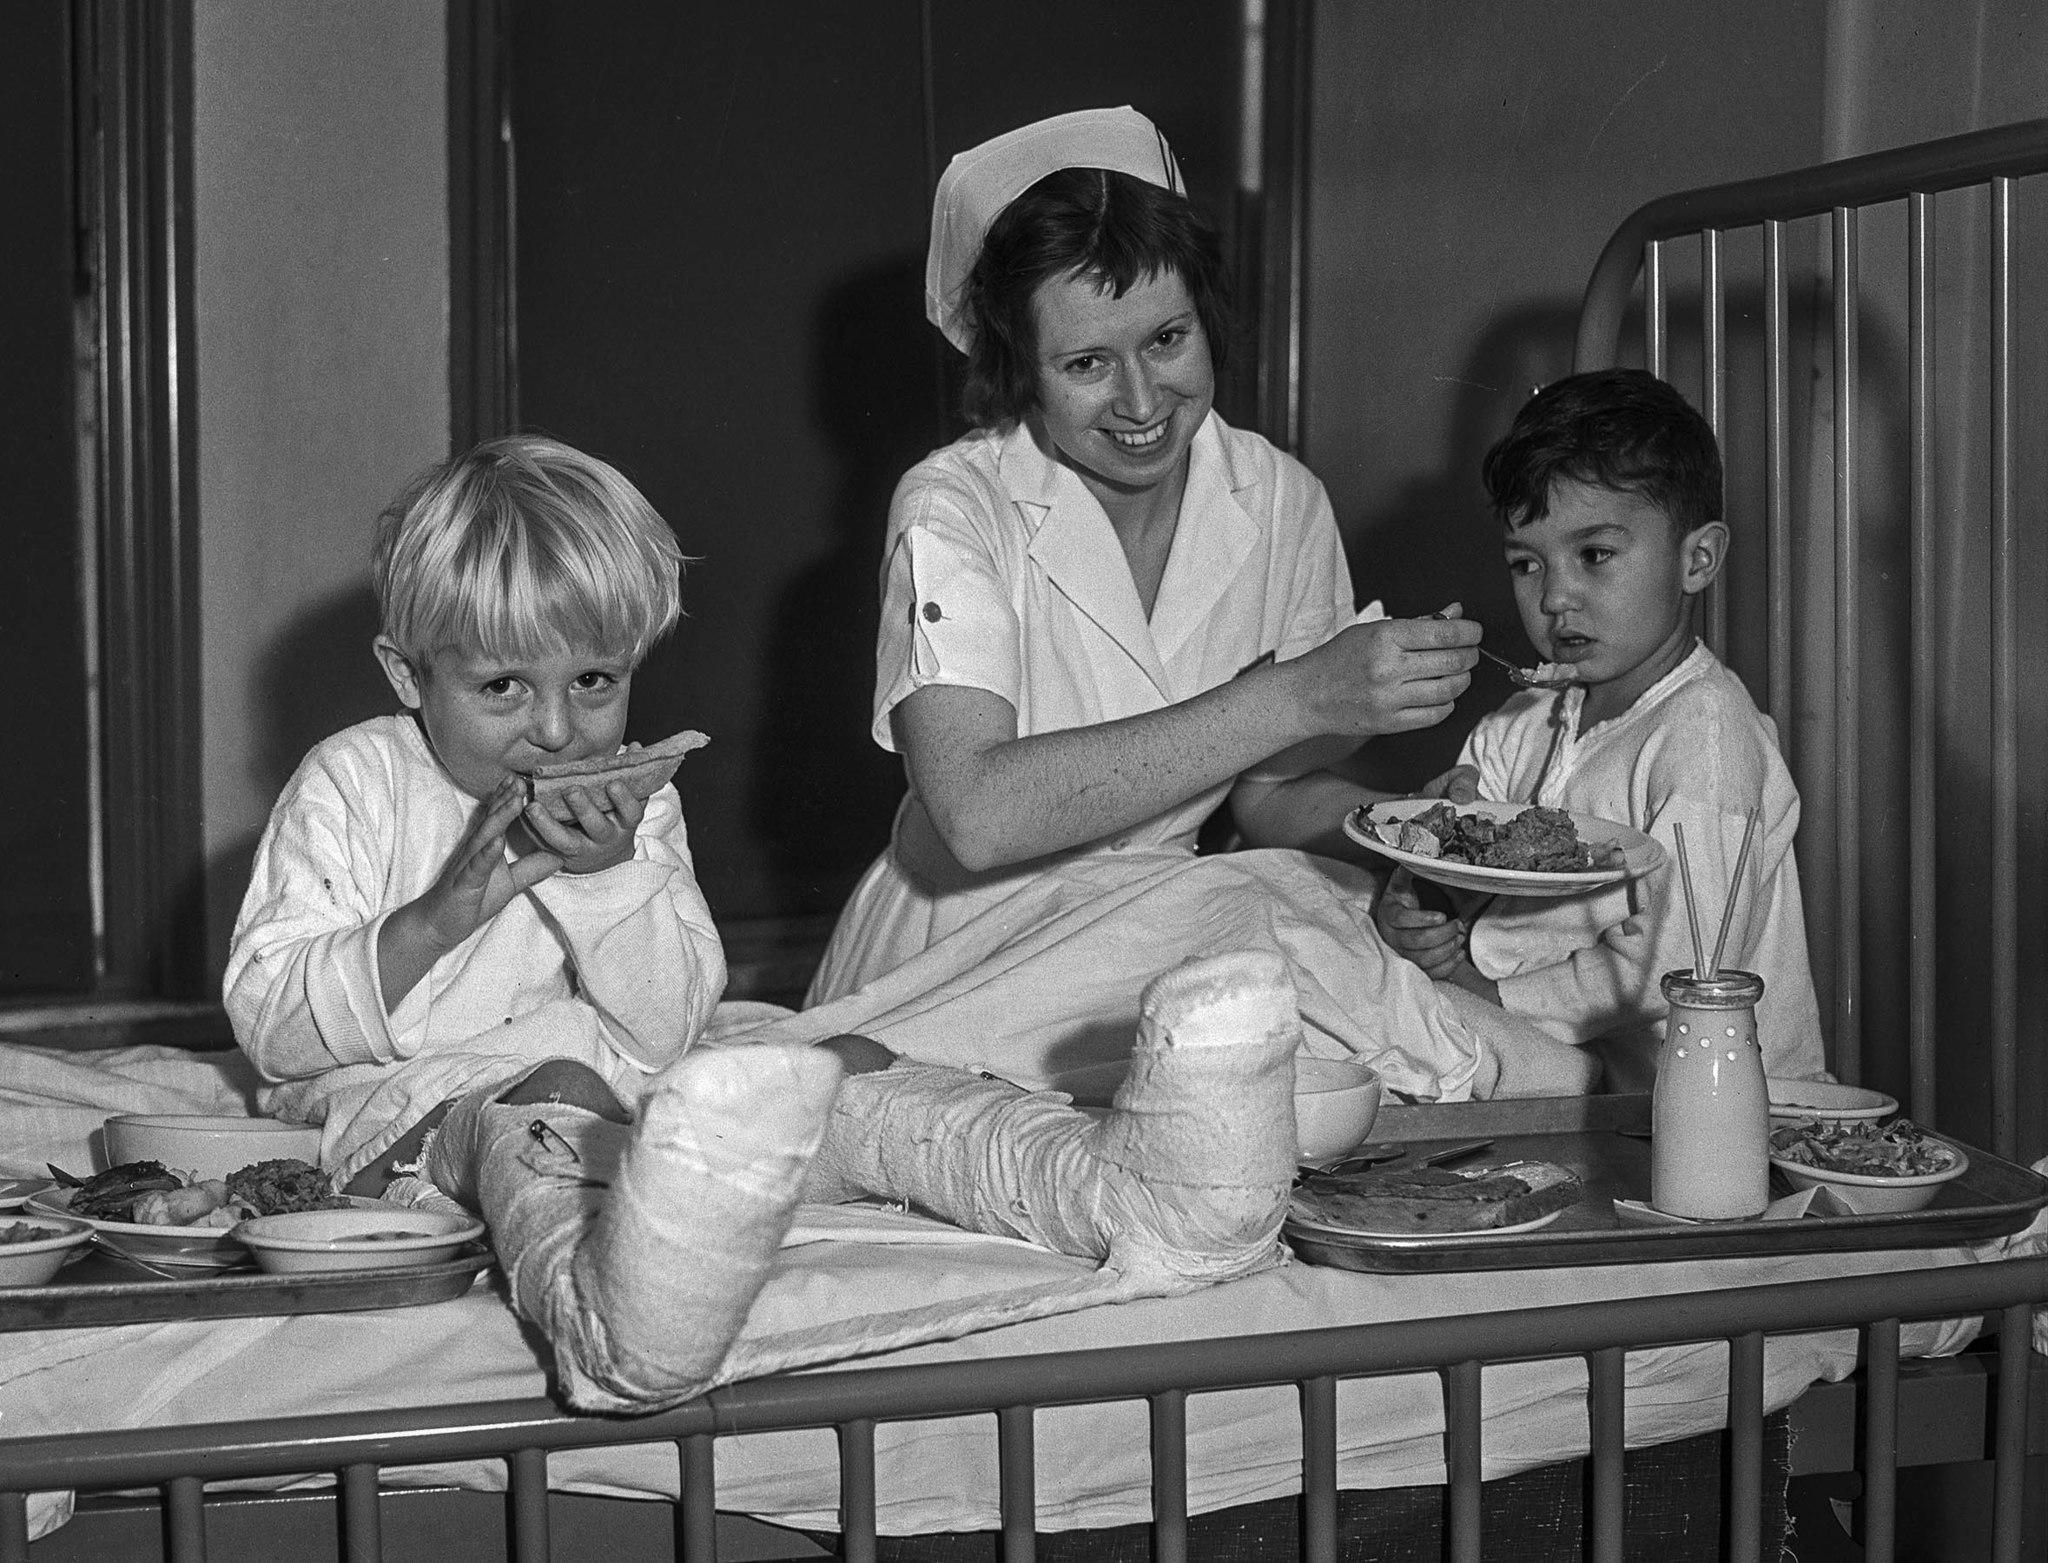 Nov. 28, 1935: Gordon Douglas, left, and Rupert Ortego are served Thanksgiving dinner by nurse Dorothy B